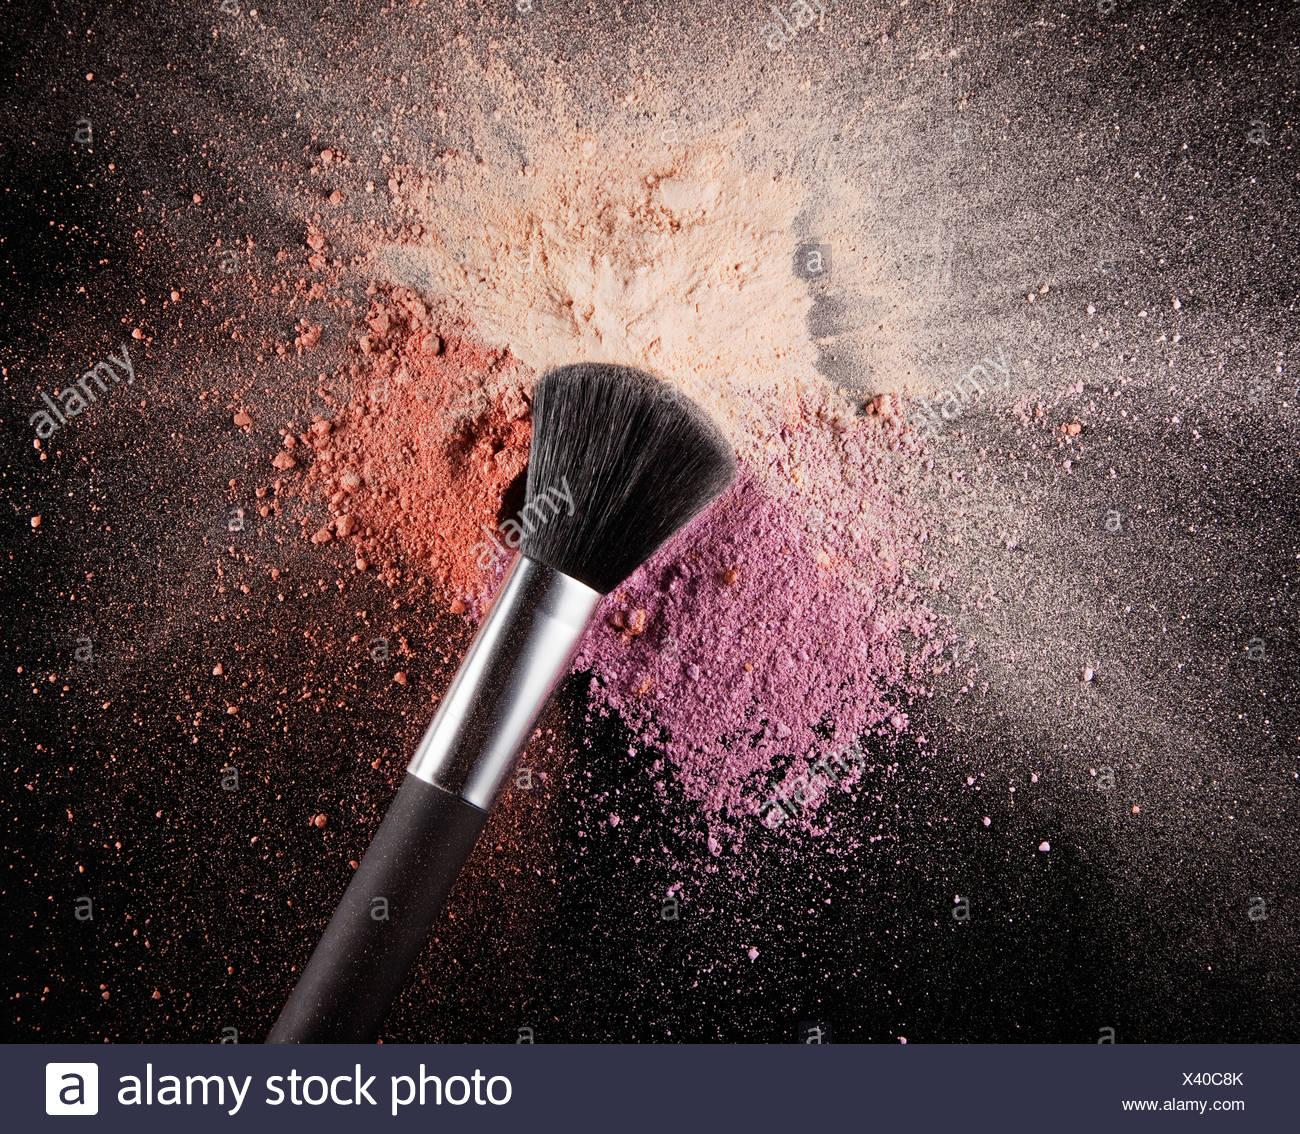 Makeup Brush Over Multicolor Blush Splatter